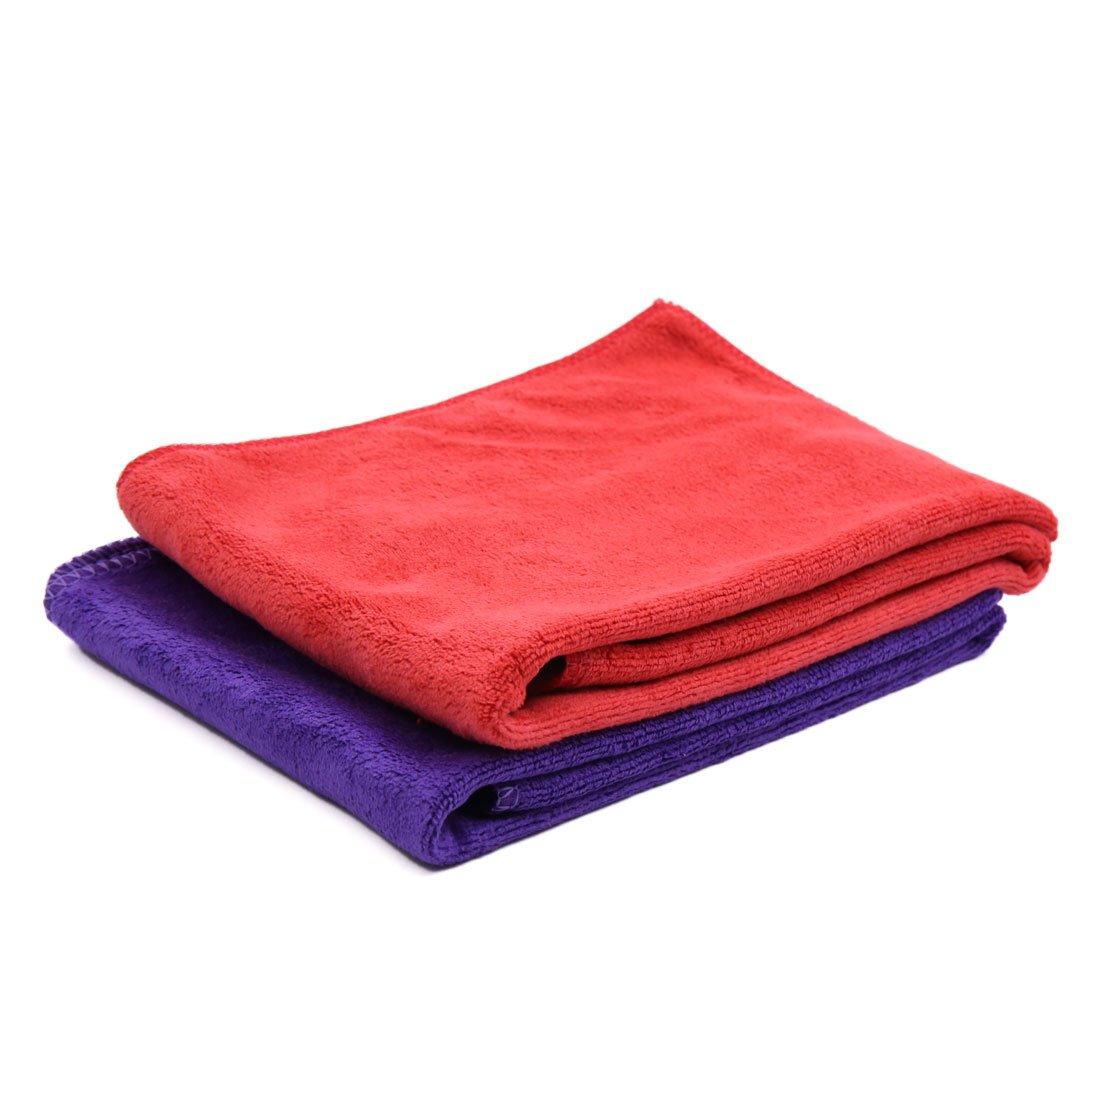 sourcingmap® 2pcs 65 x 33cm 400gsm coche toalla Absorbente limpieza de microfibra rojo púrpura a17030600ux0094